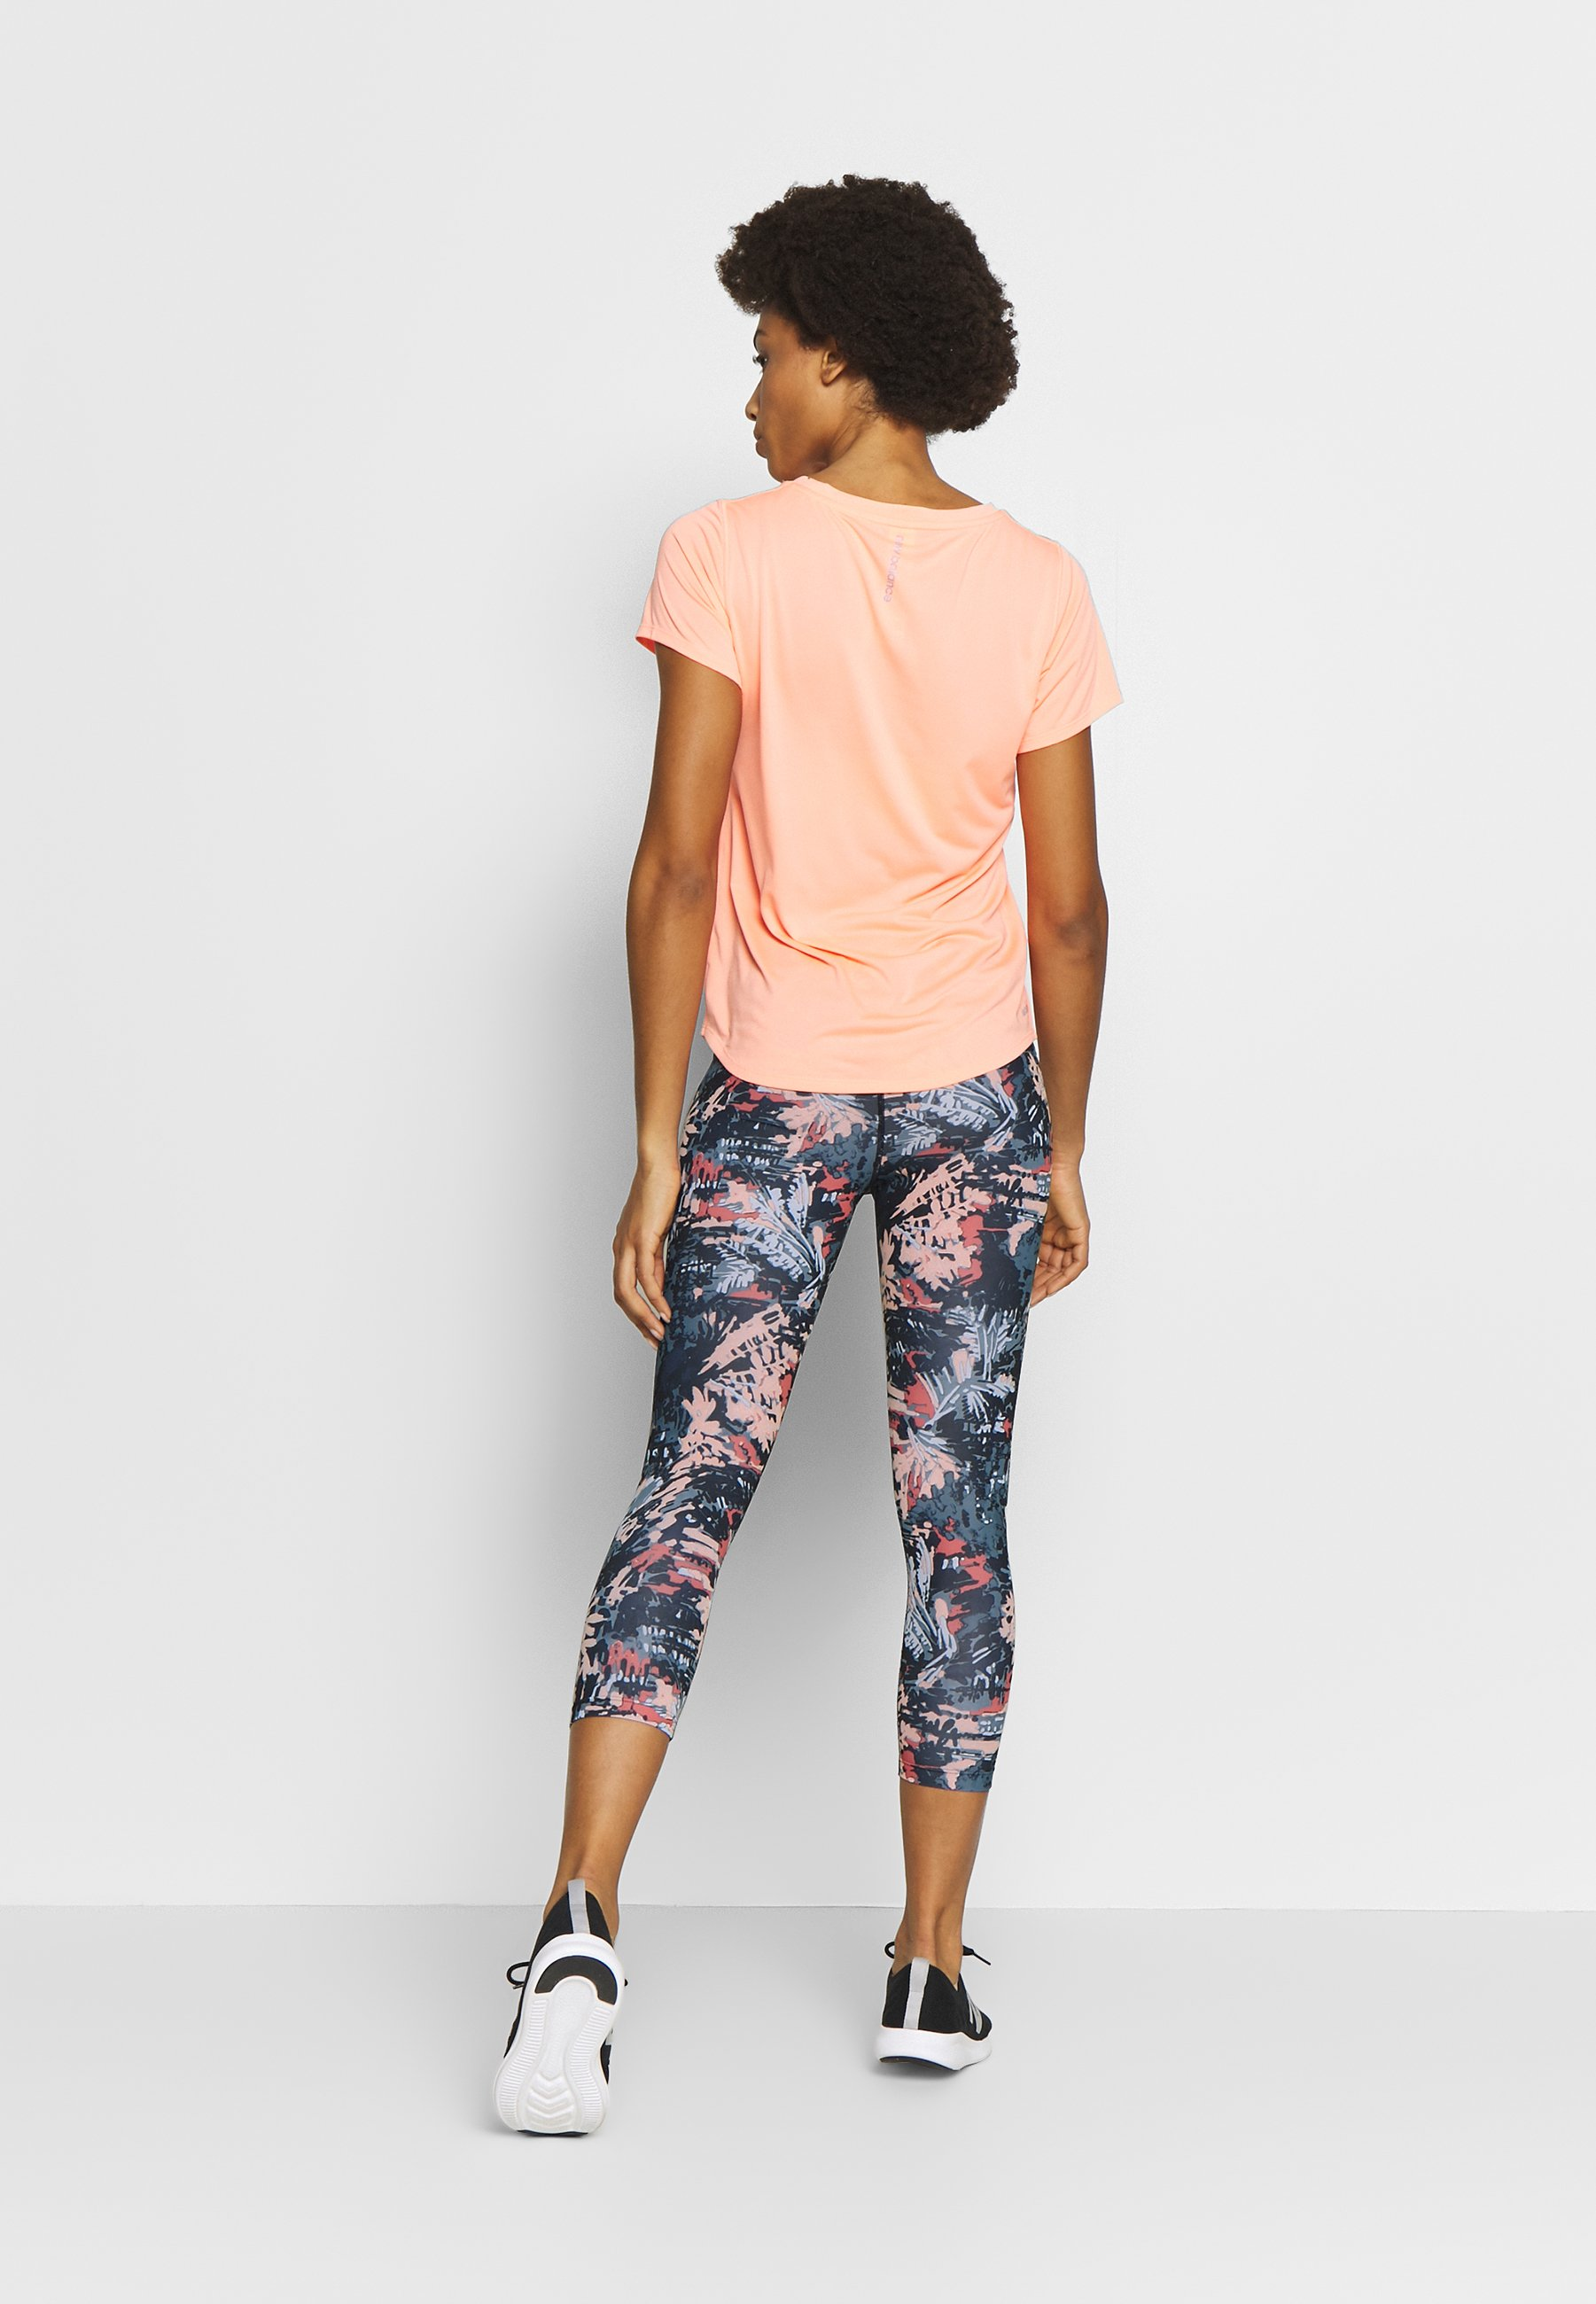 Femme PRINTED ACCELERATE CAPRI - Pantalon 3/4 de sport